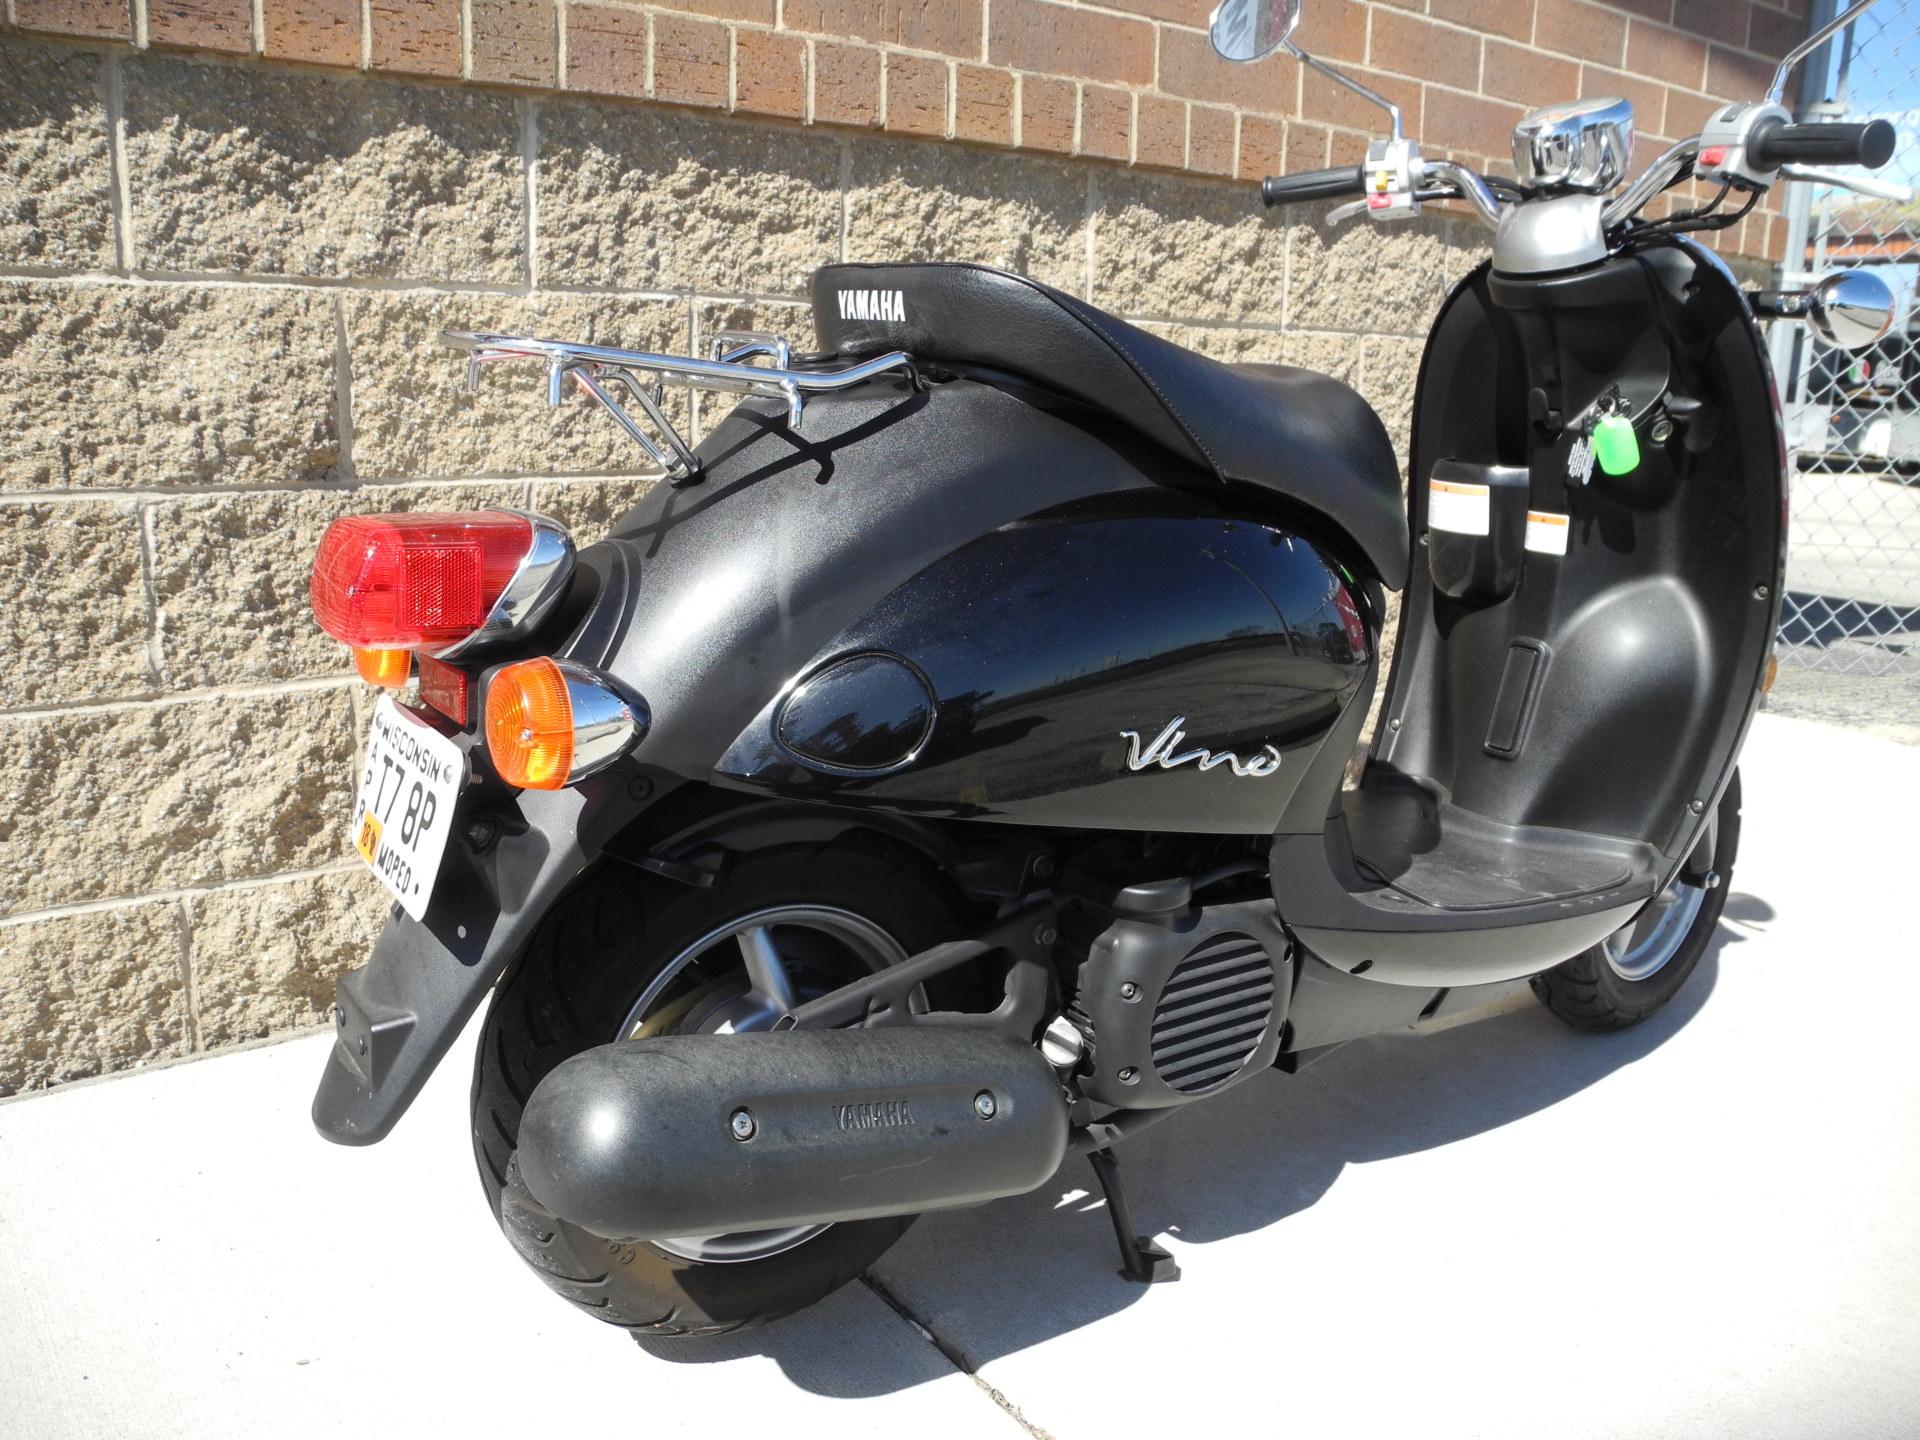 2007 Yamaha Vino 50 Moped